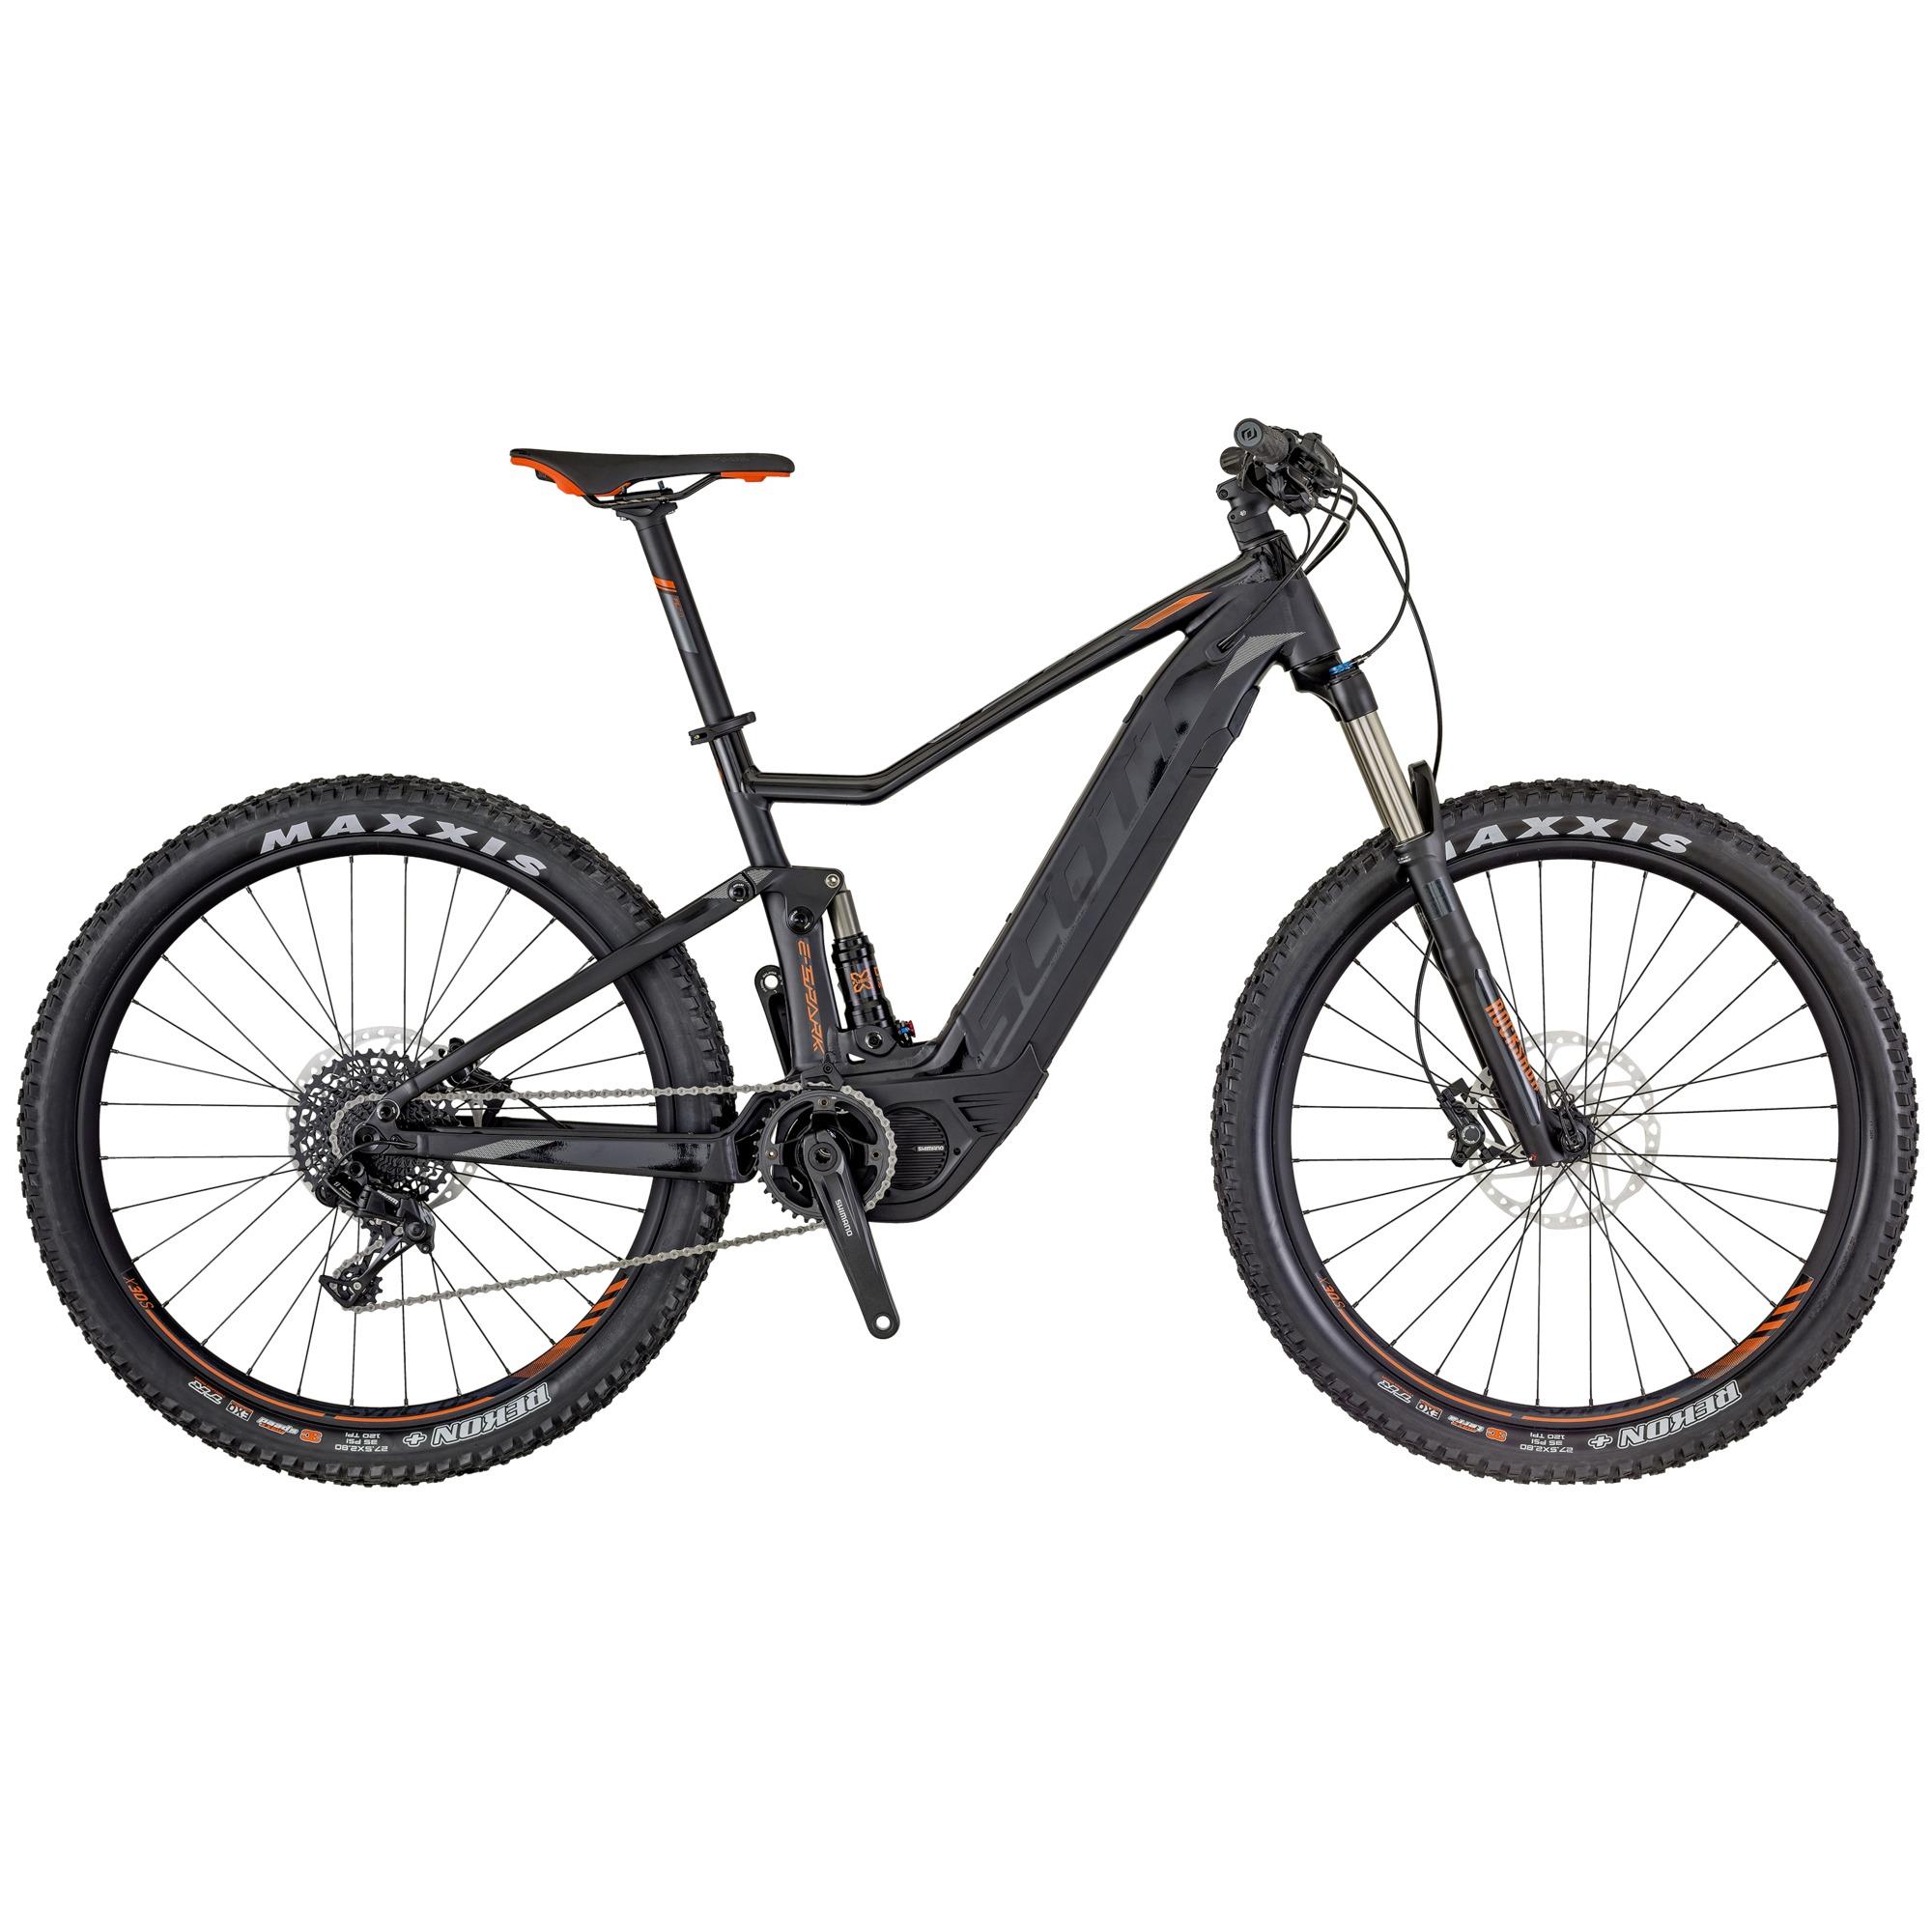 SCOTT E-Spark 730 Fahrrad L - Zweirad Homann